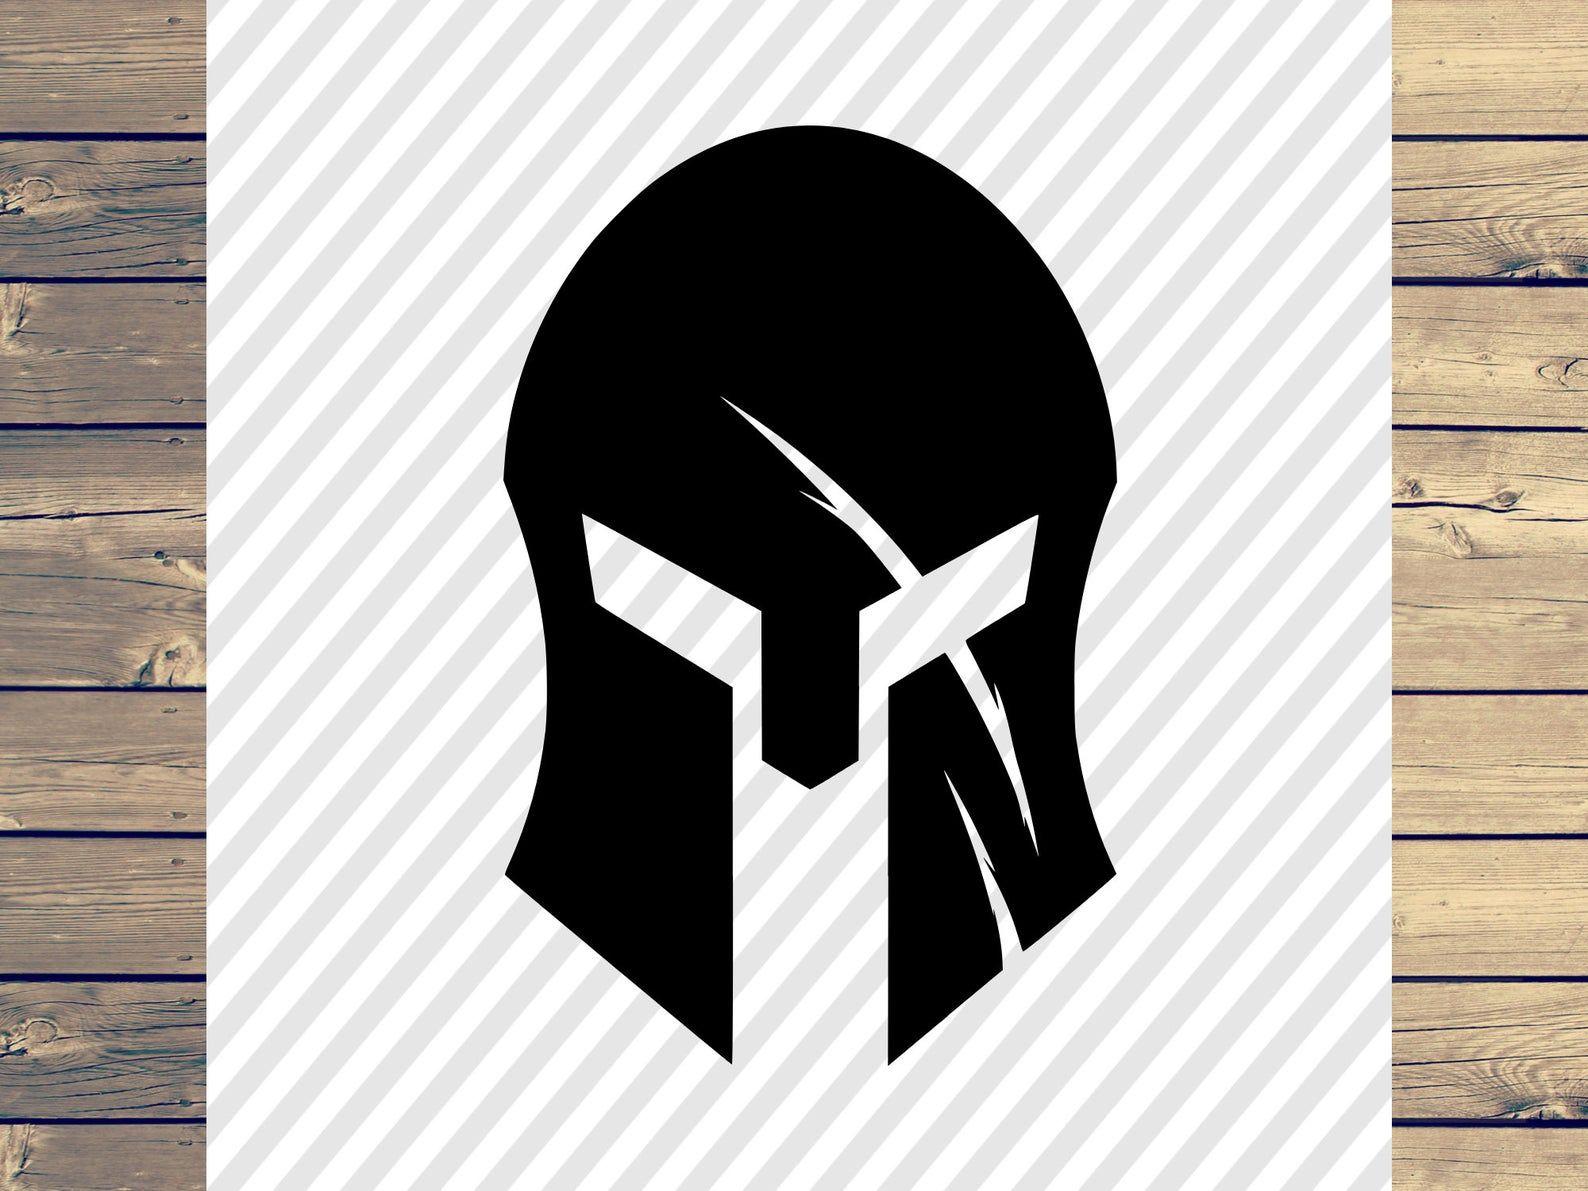 Spartan Helmet With Scar Svg Filespartan Helmet With Scar Etsy In 2021 Spartan Helmet Spartan Helmet Tattoo Spartan